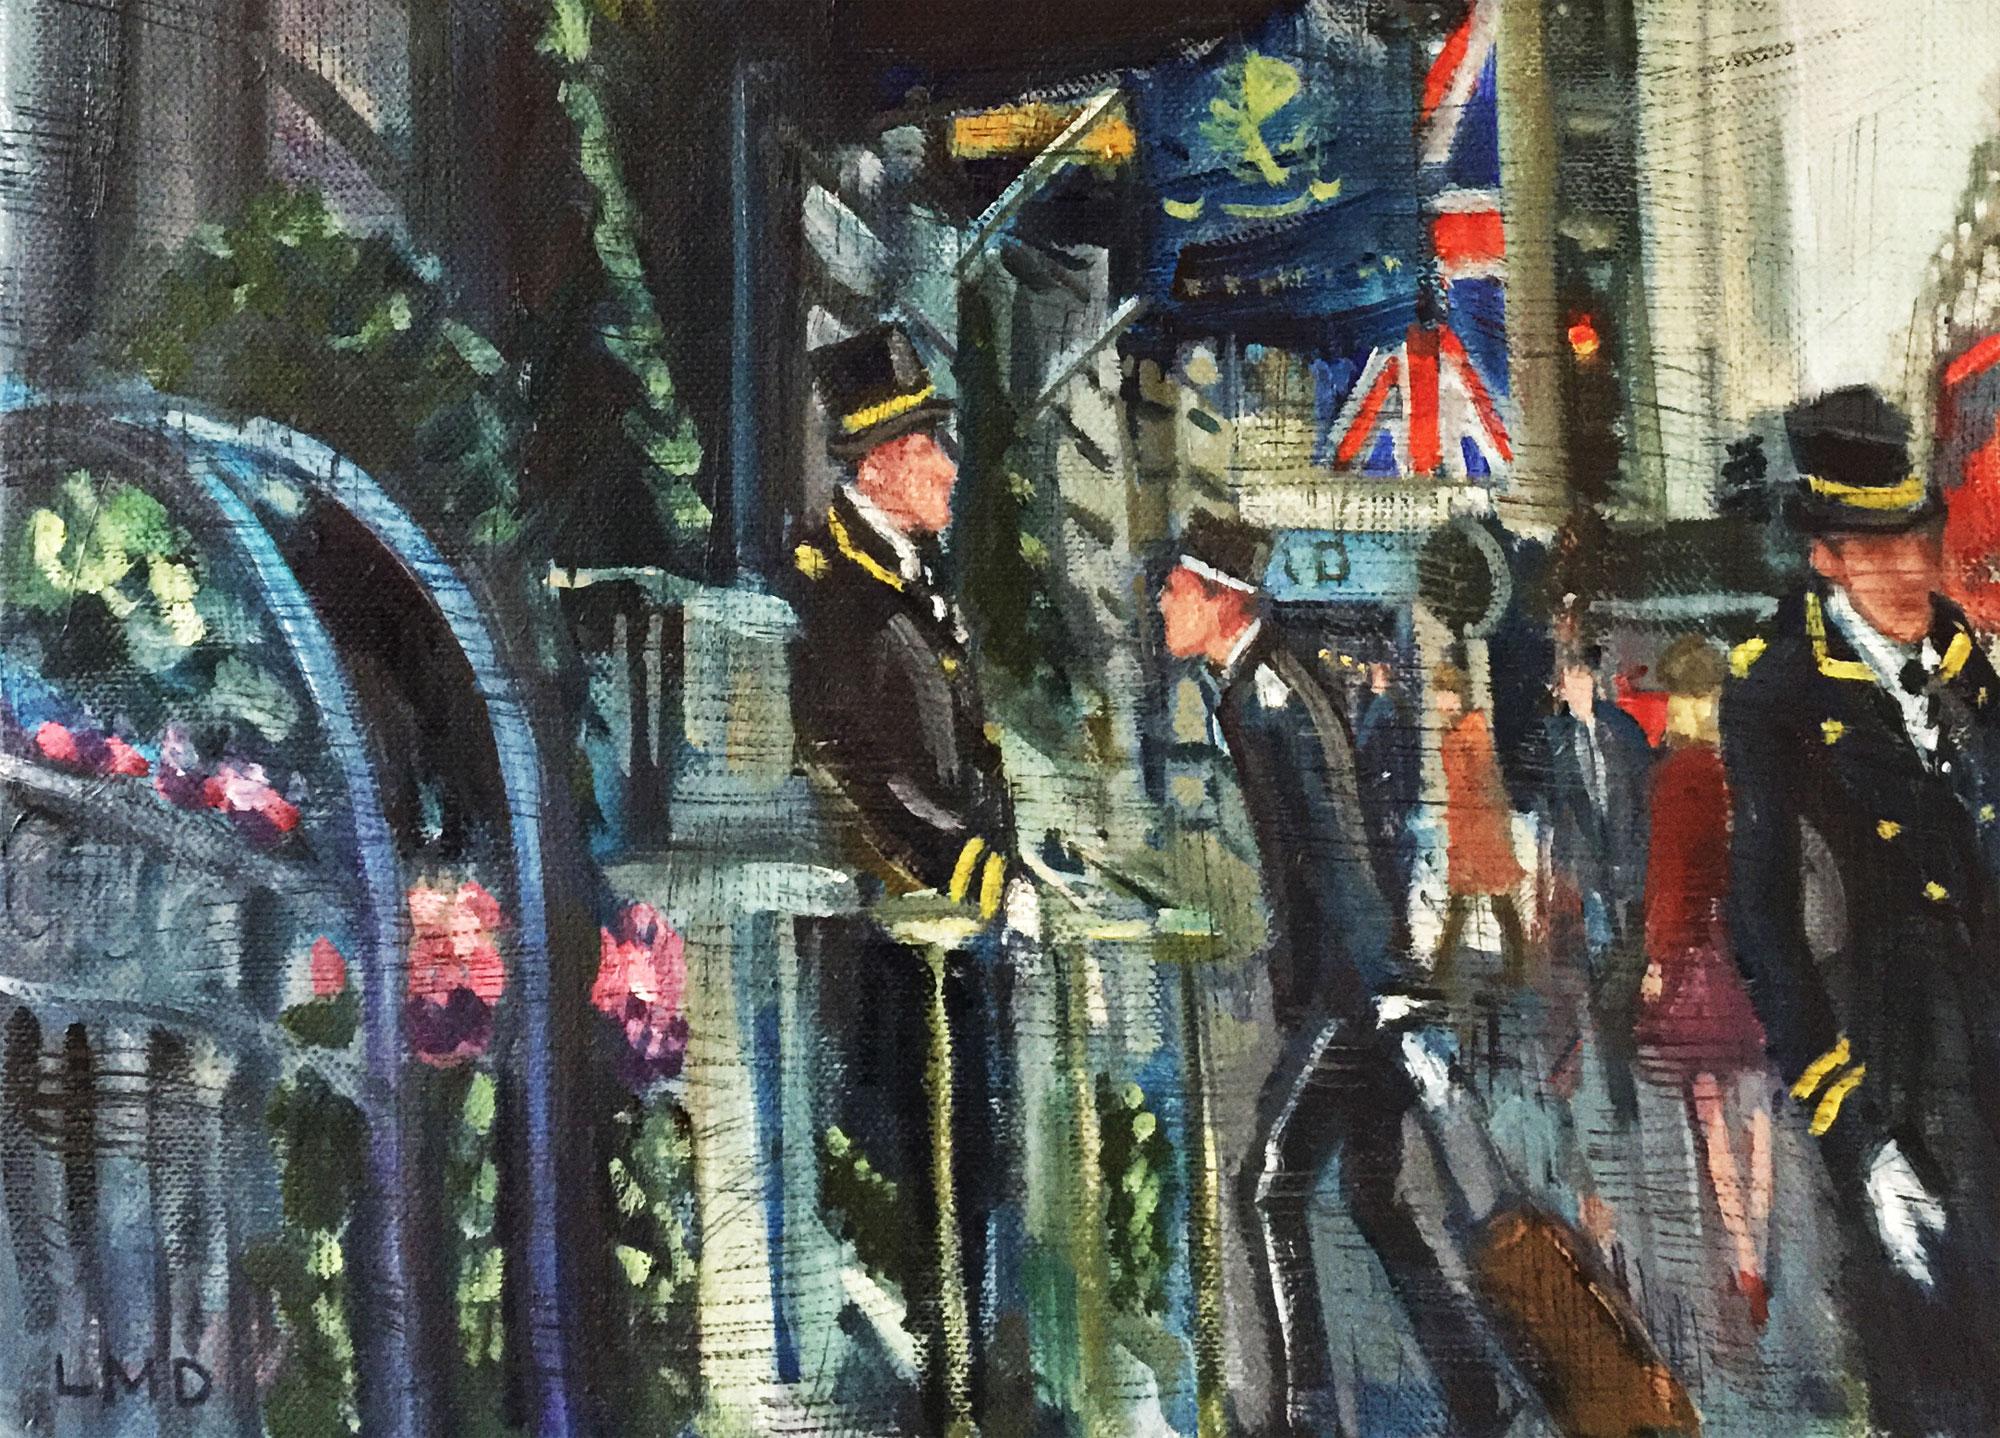 Artist Spotlight On The Painter, Lucy Dickens